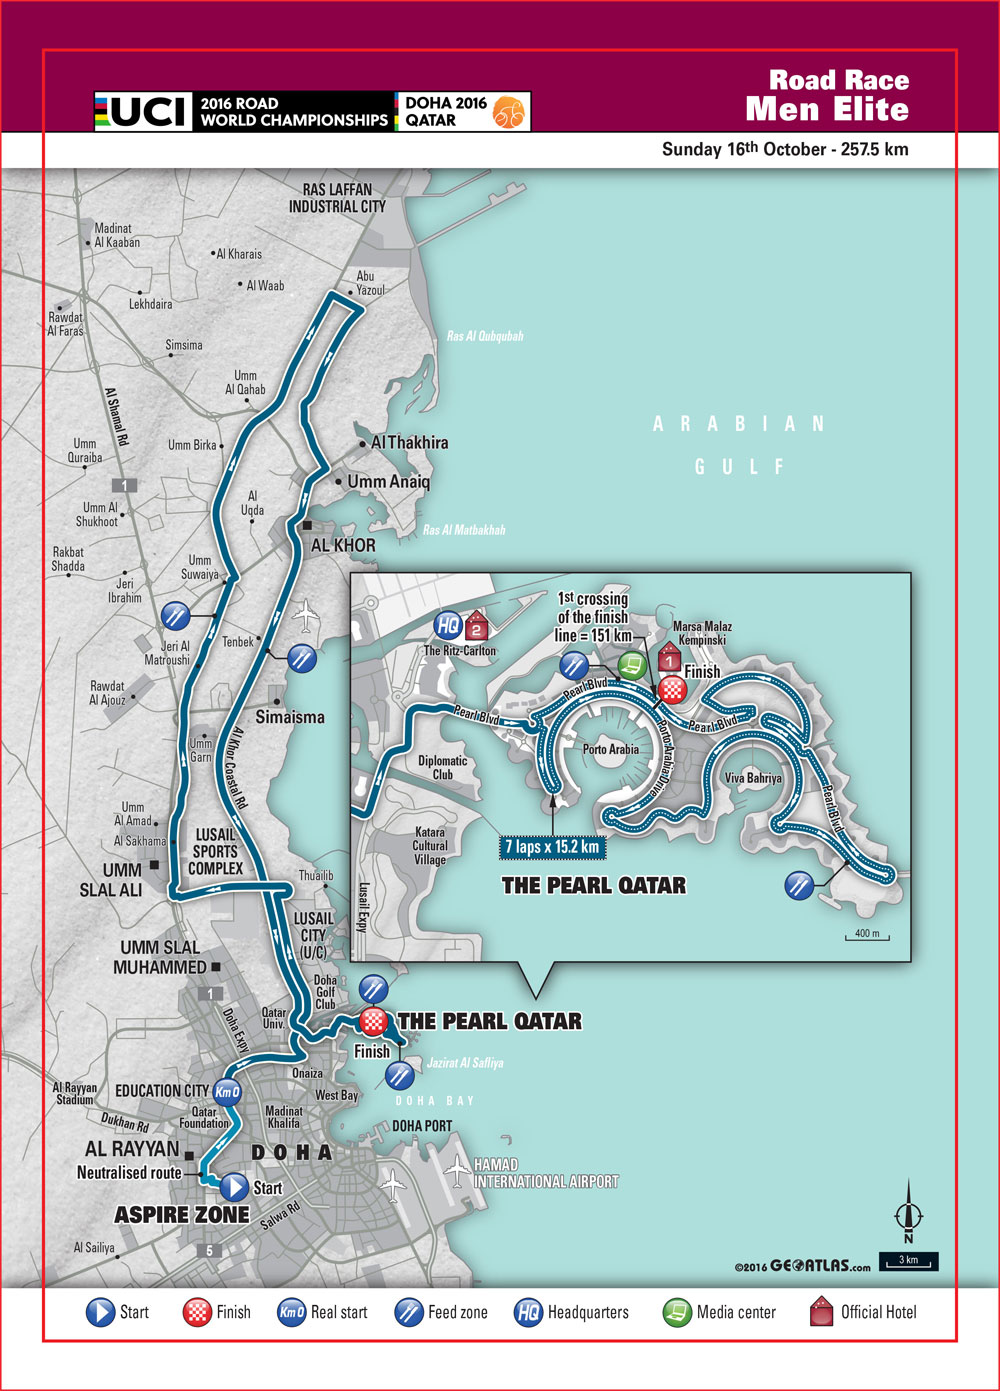 Doha 2016 Uci World Road Championships Men Elite Road Race Map The